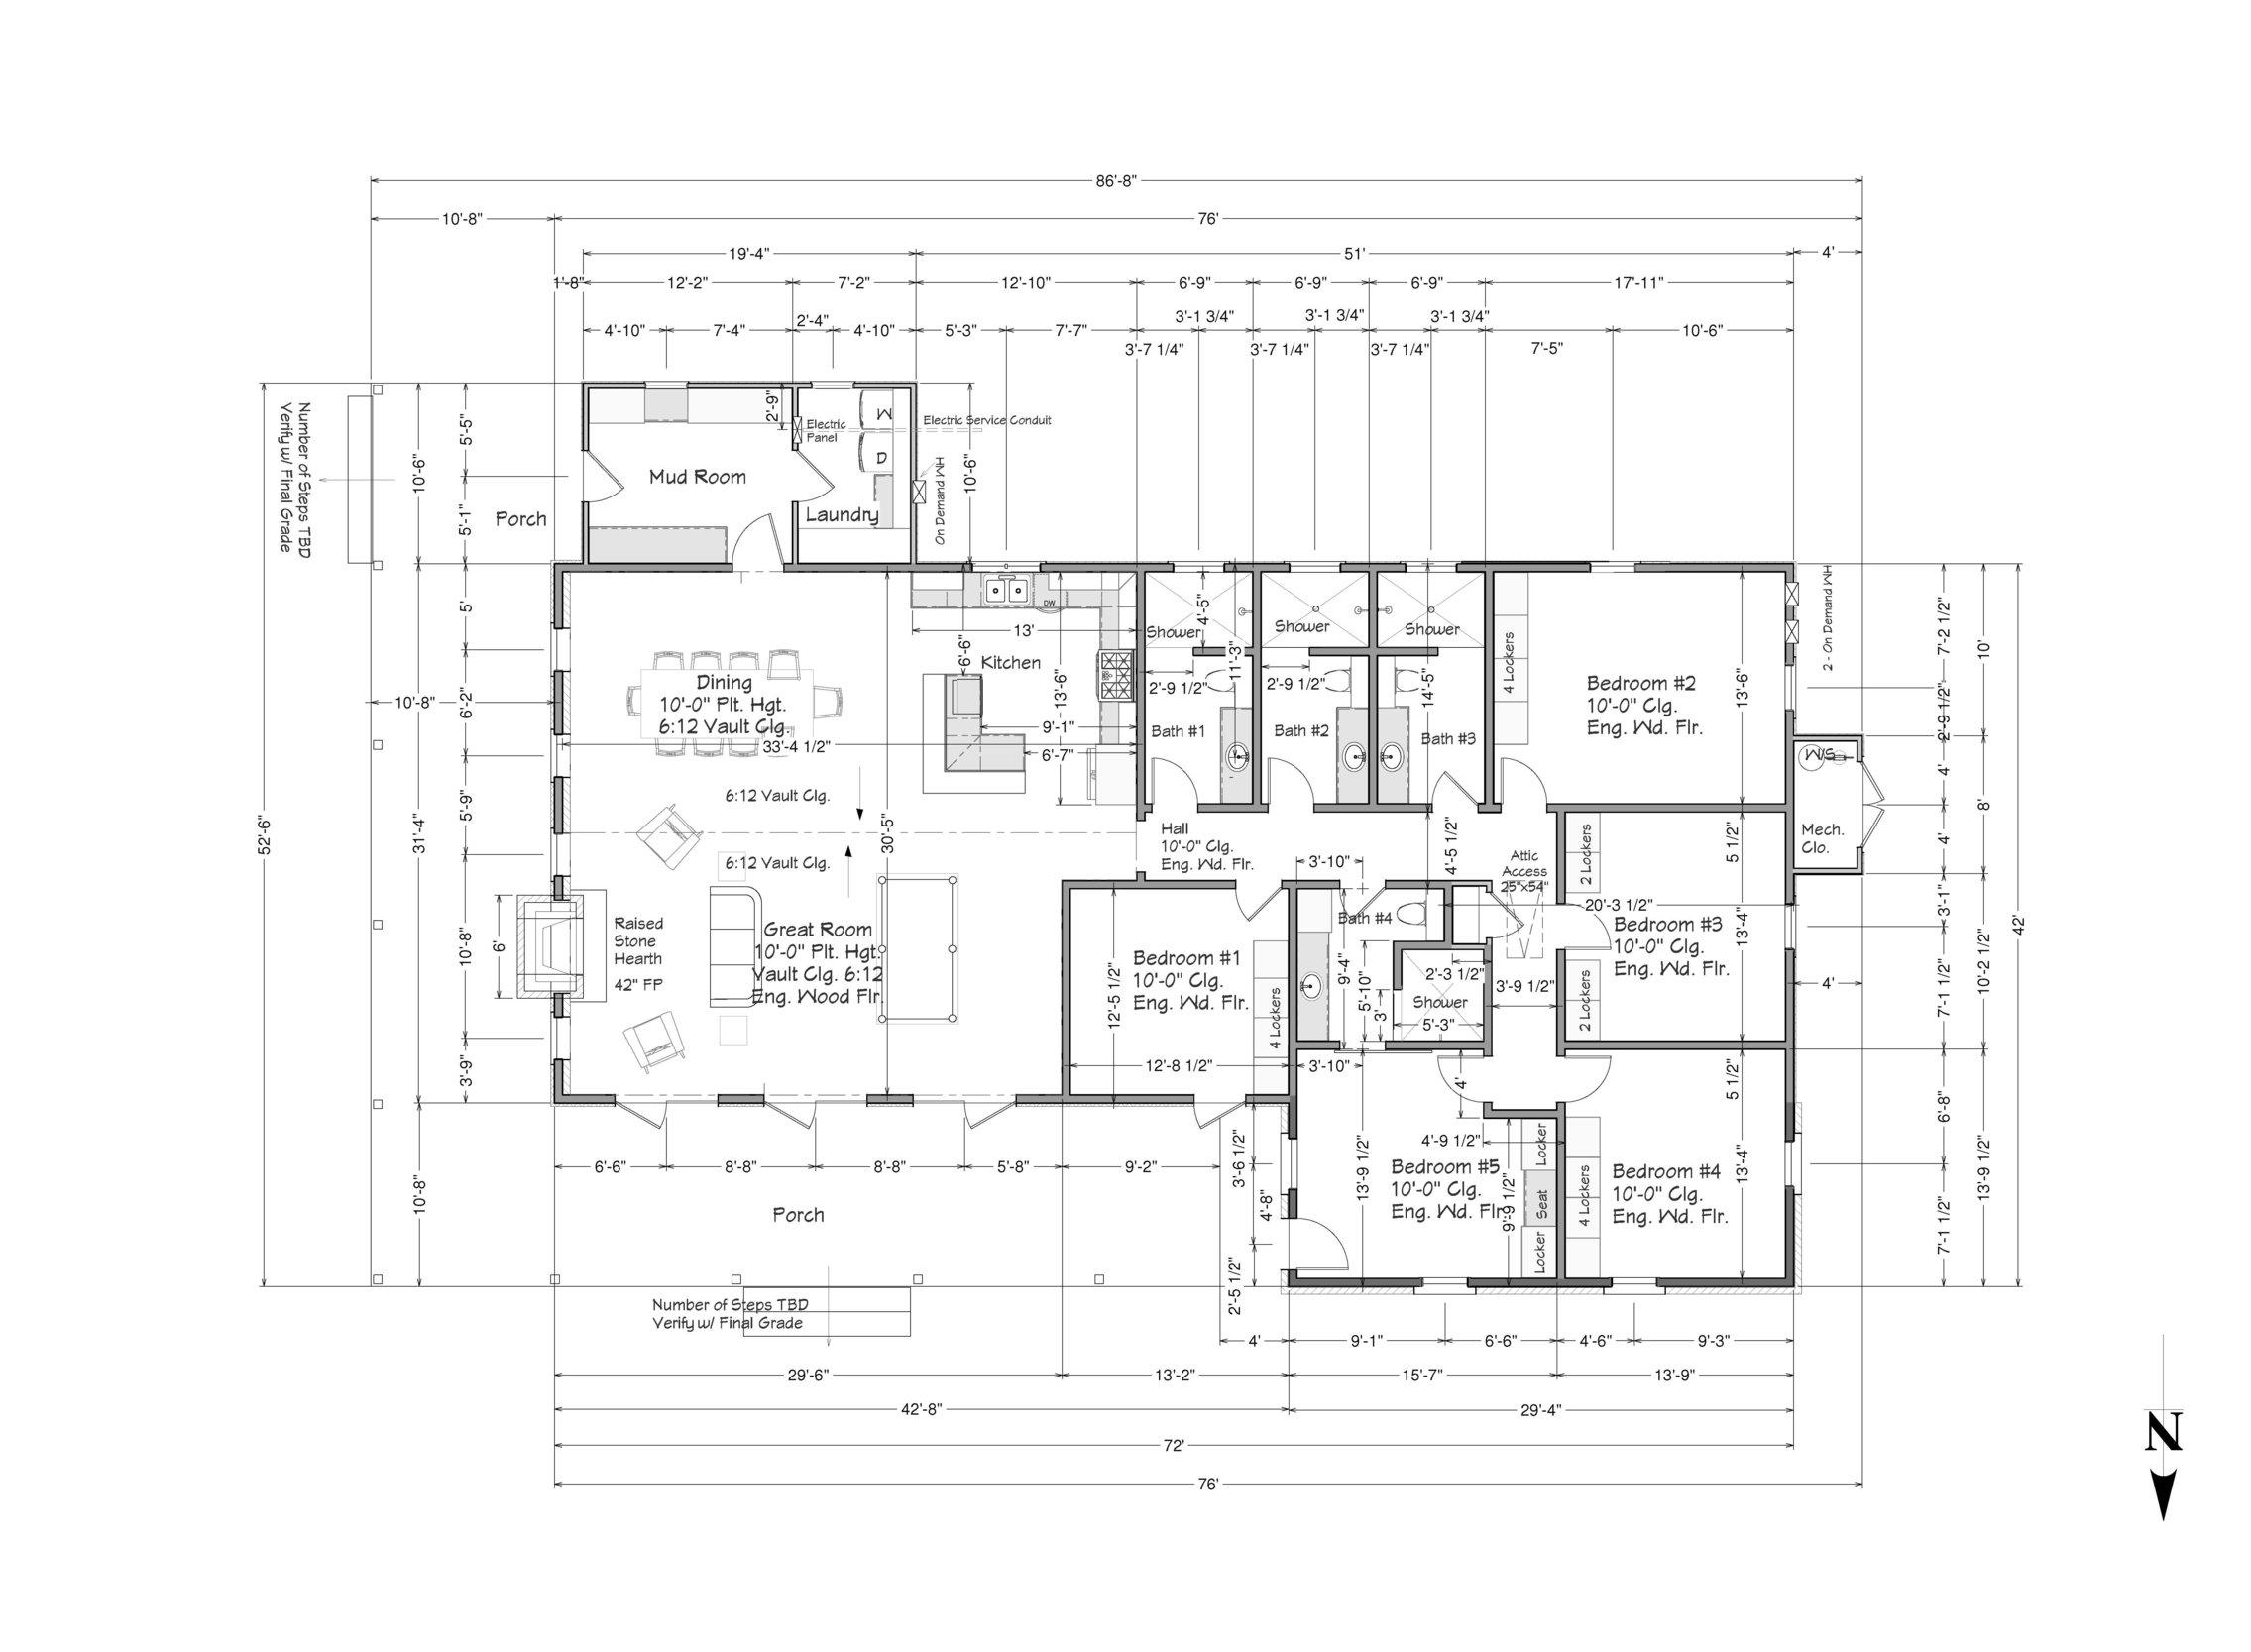 MM Ranch 11-5-13 Dimensions.jpg